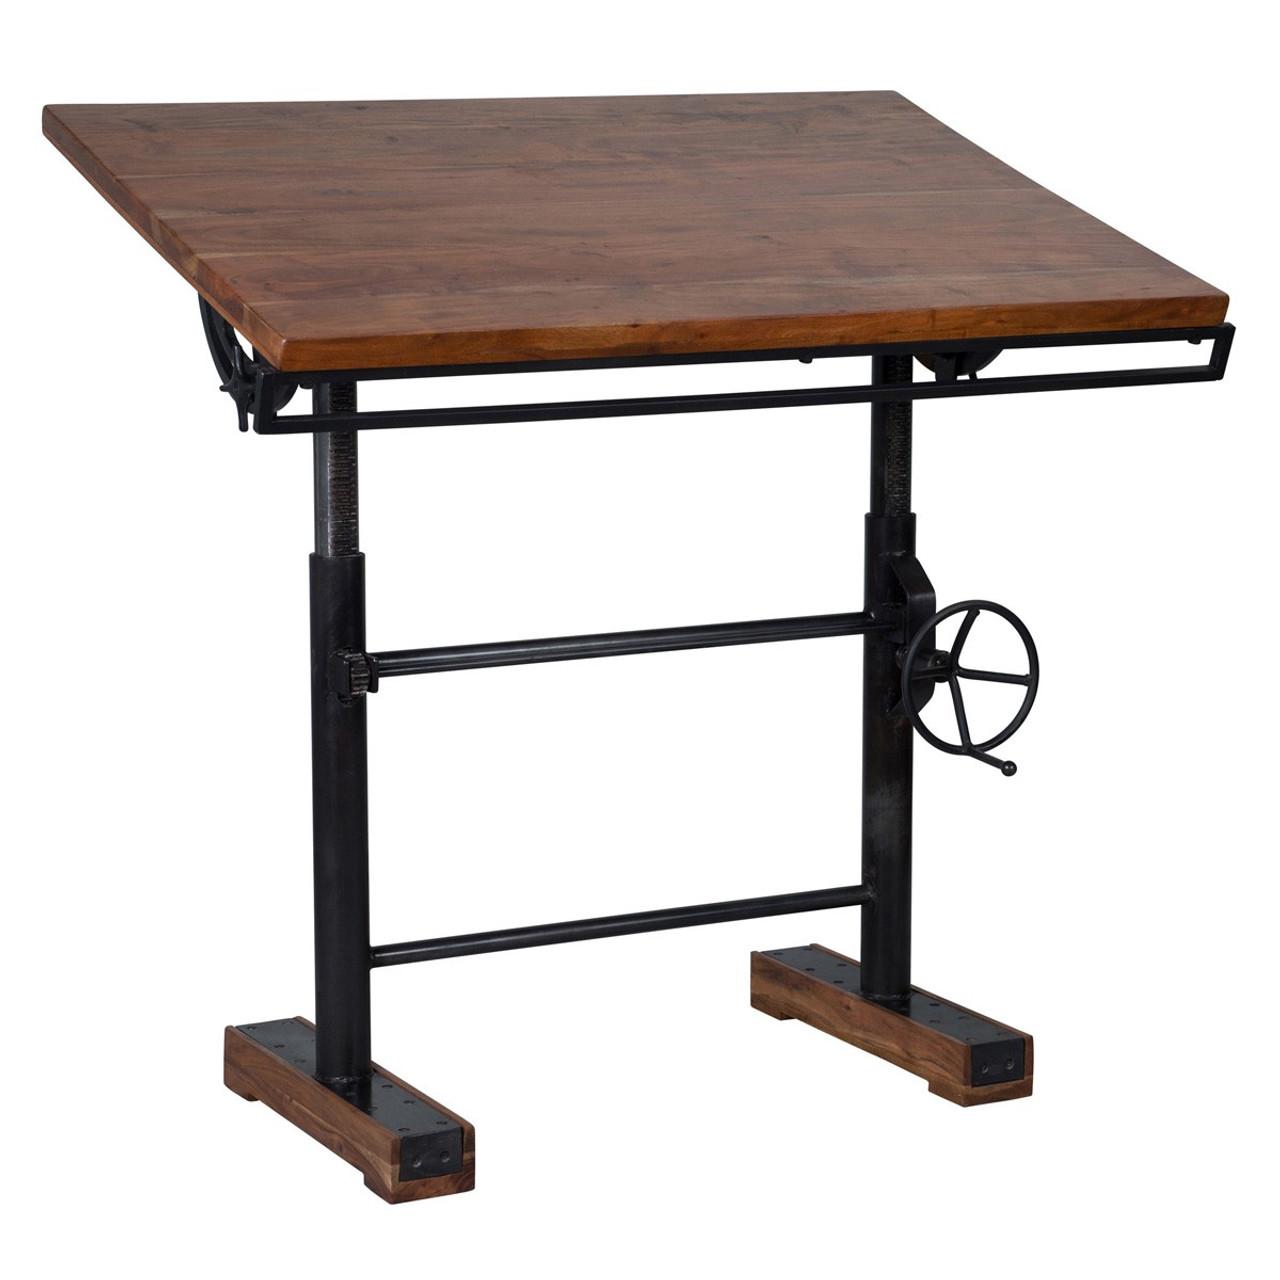 Steampunk Industrial Crank Adjustable Standing Desk 46